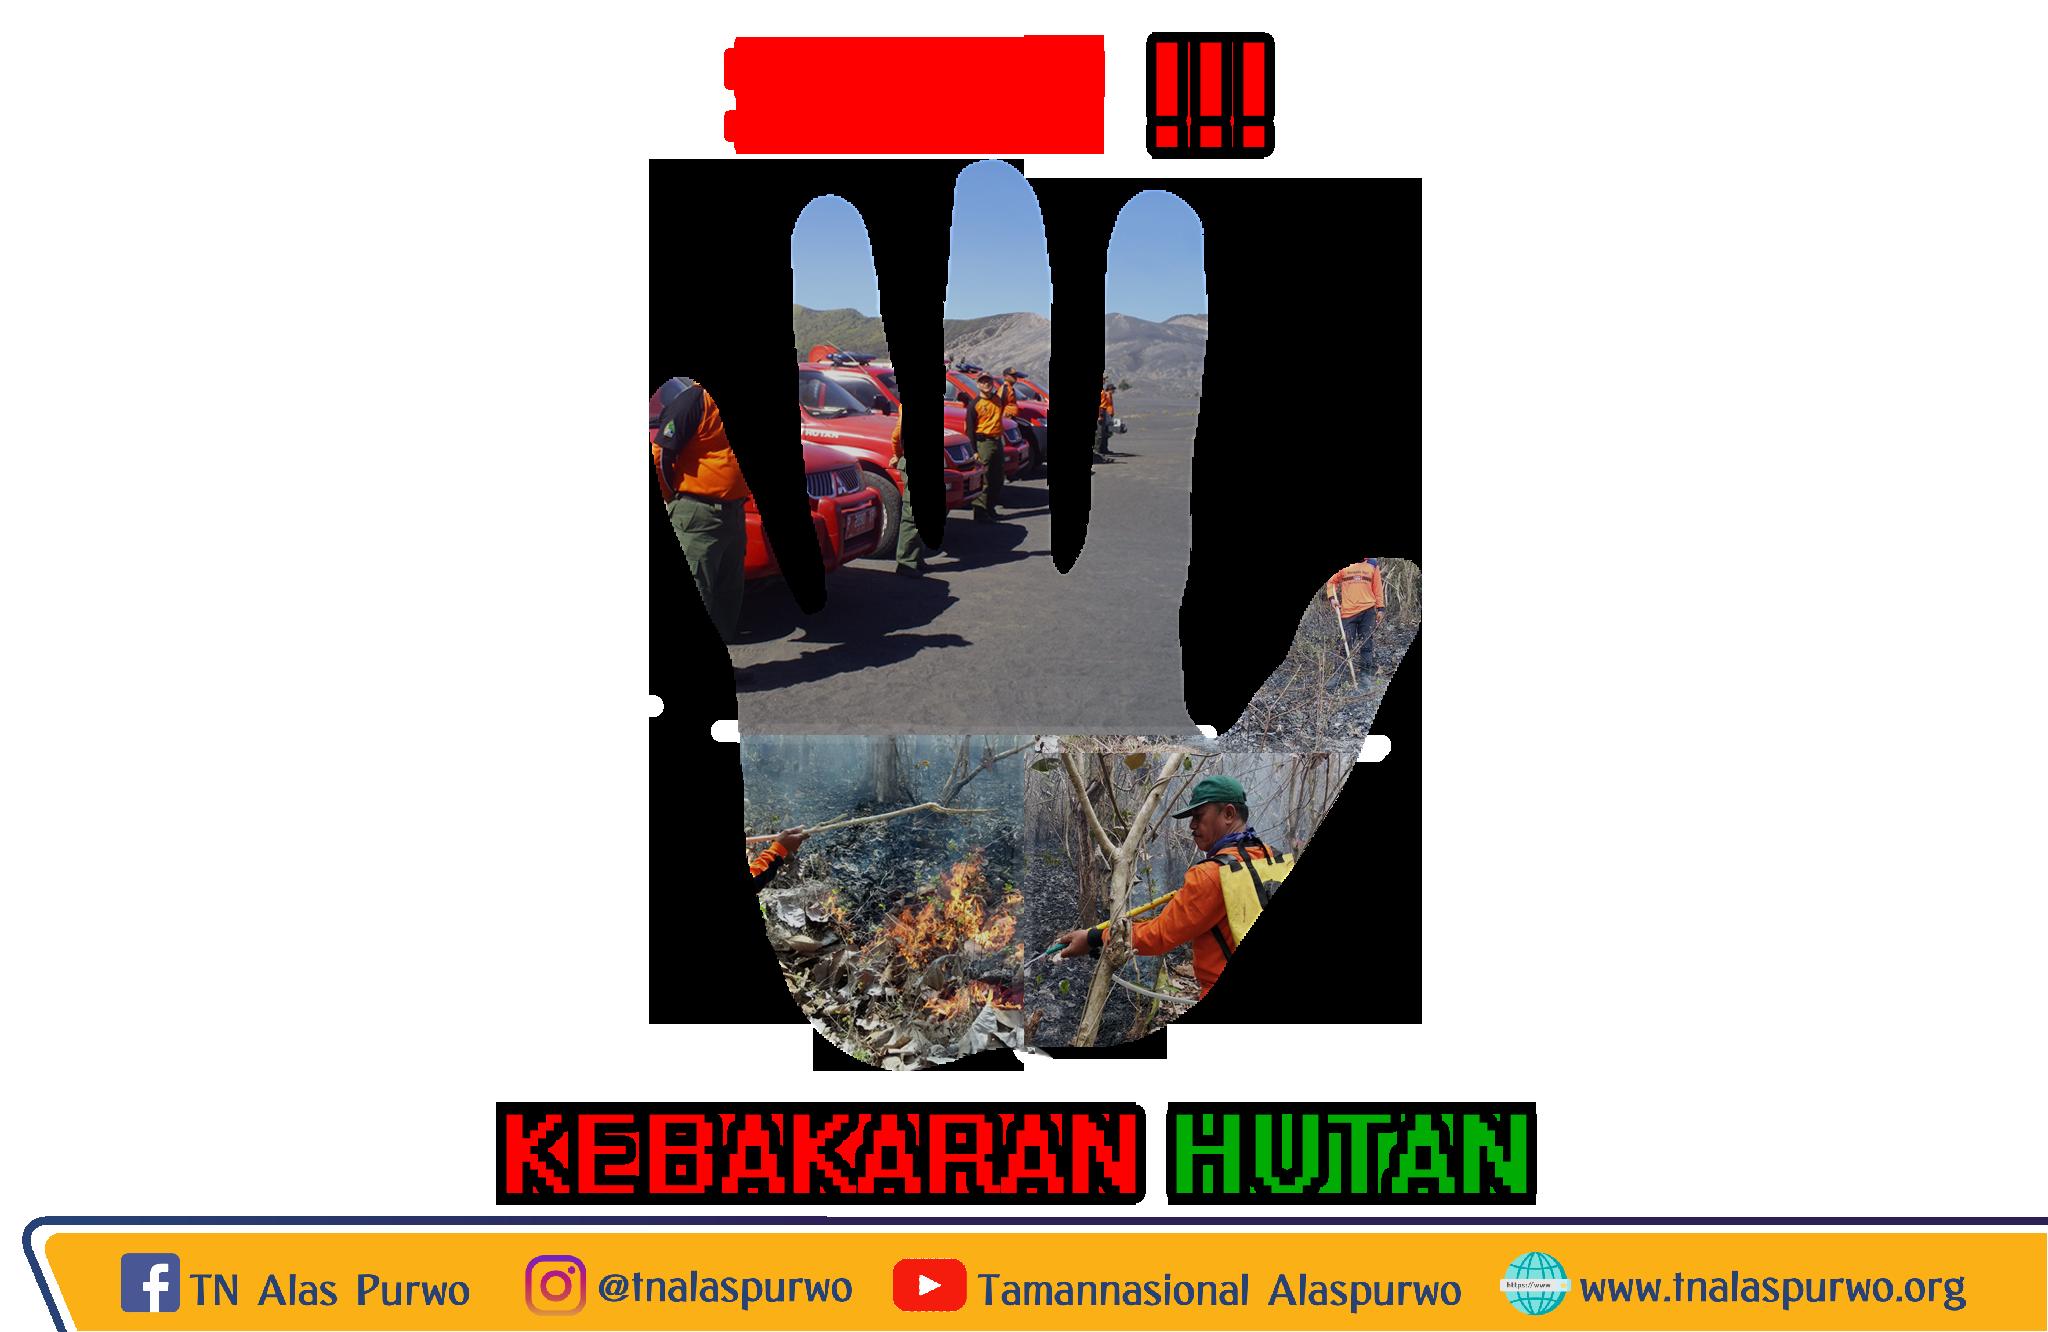 Stop Kebakaran Hutan, TN Alas Purwo, TNAP, Alas Purwo, Taman Nasional Alas Purwo